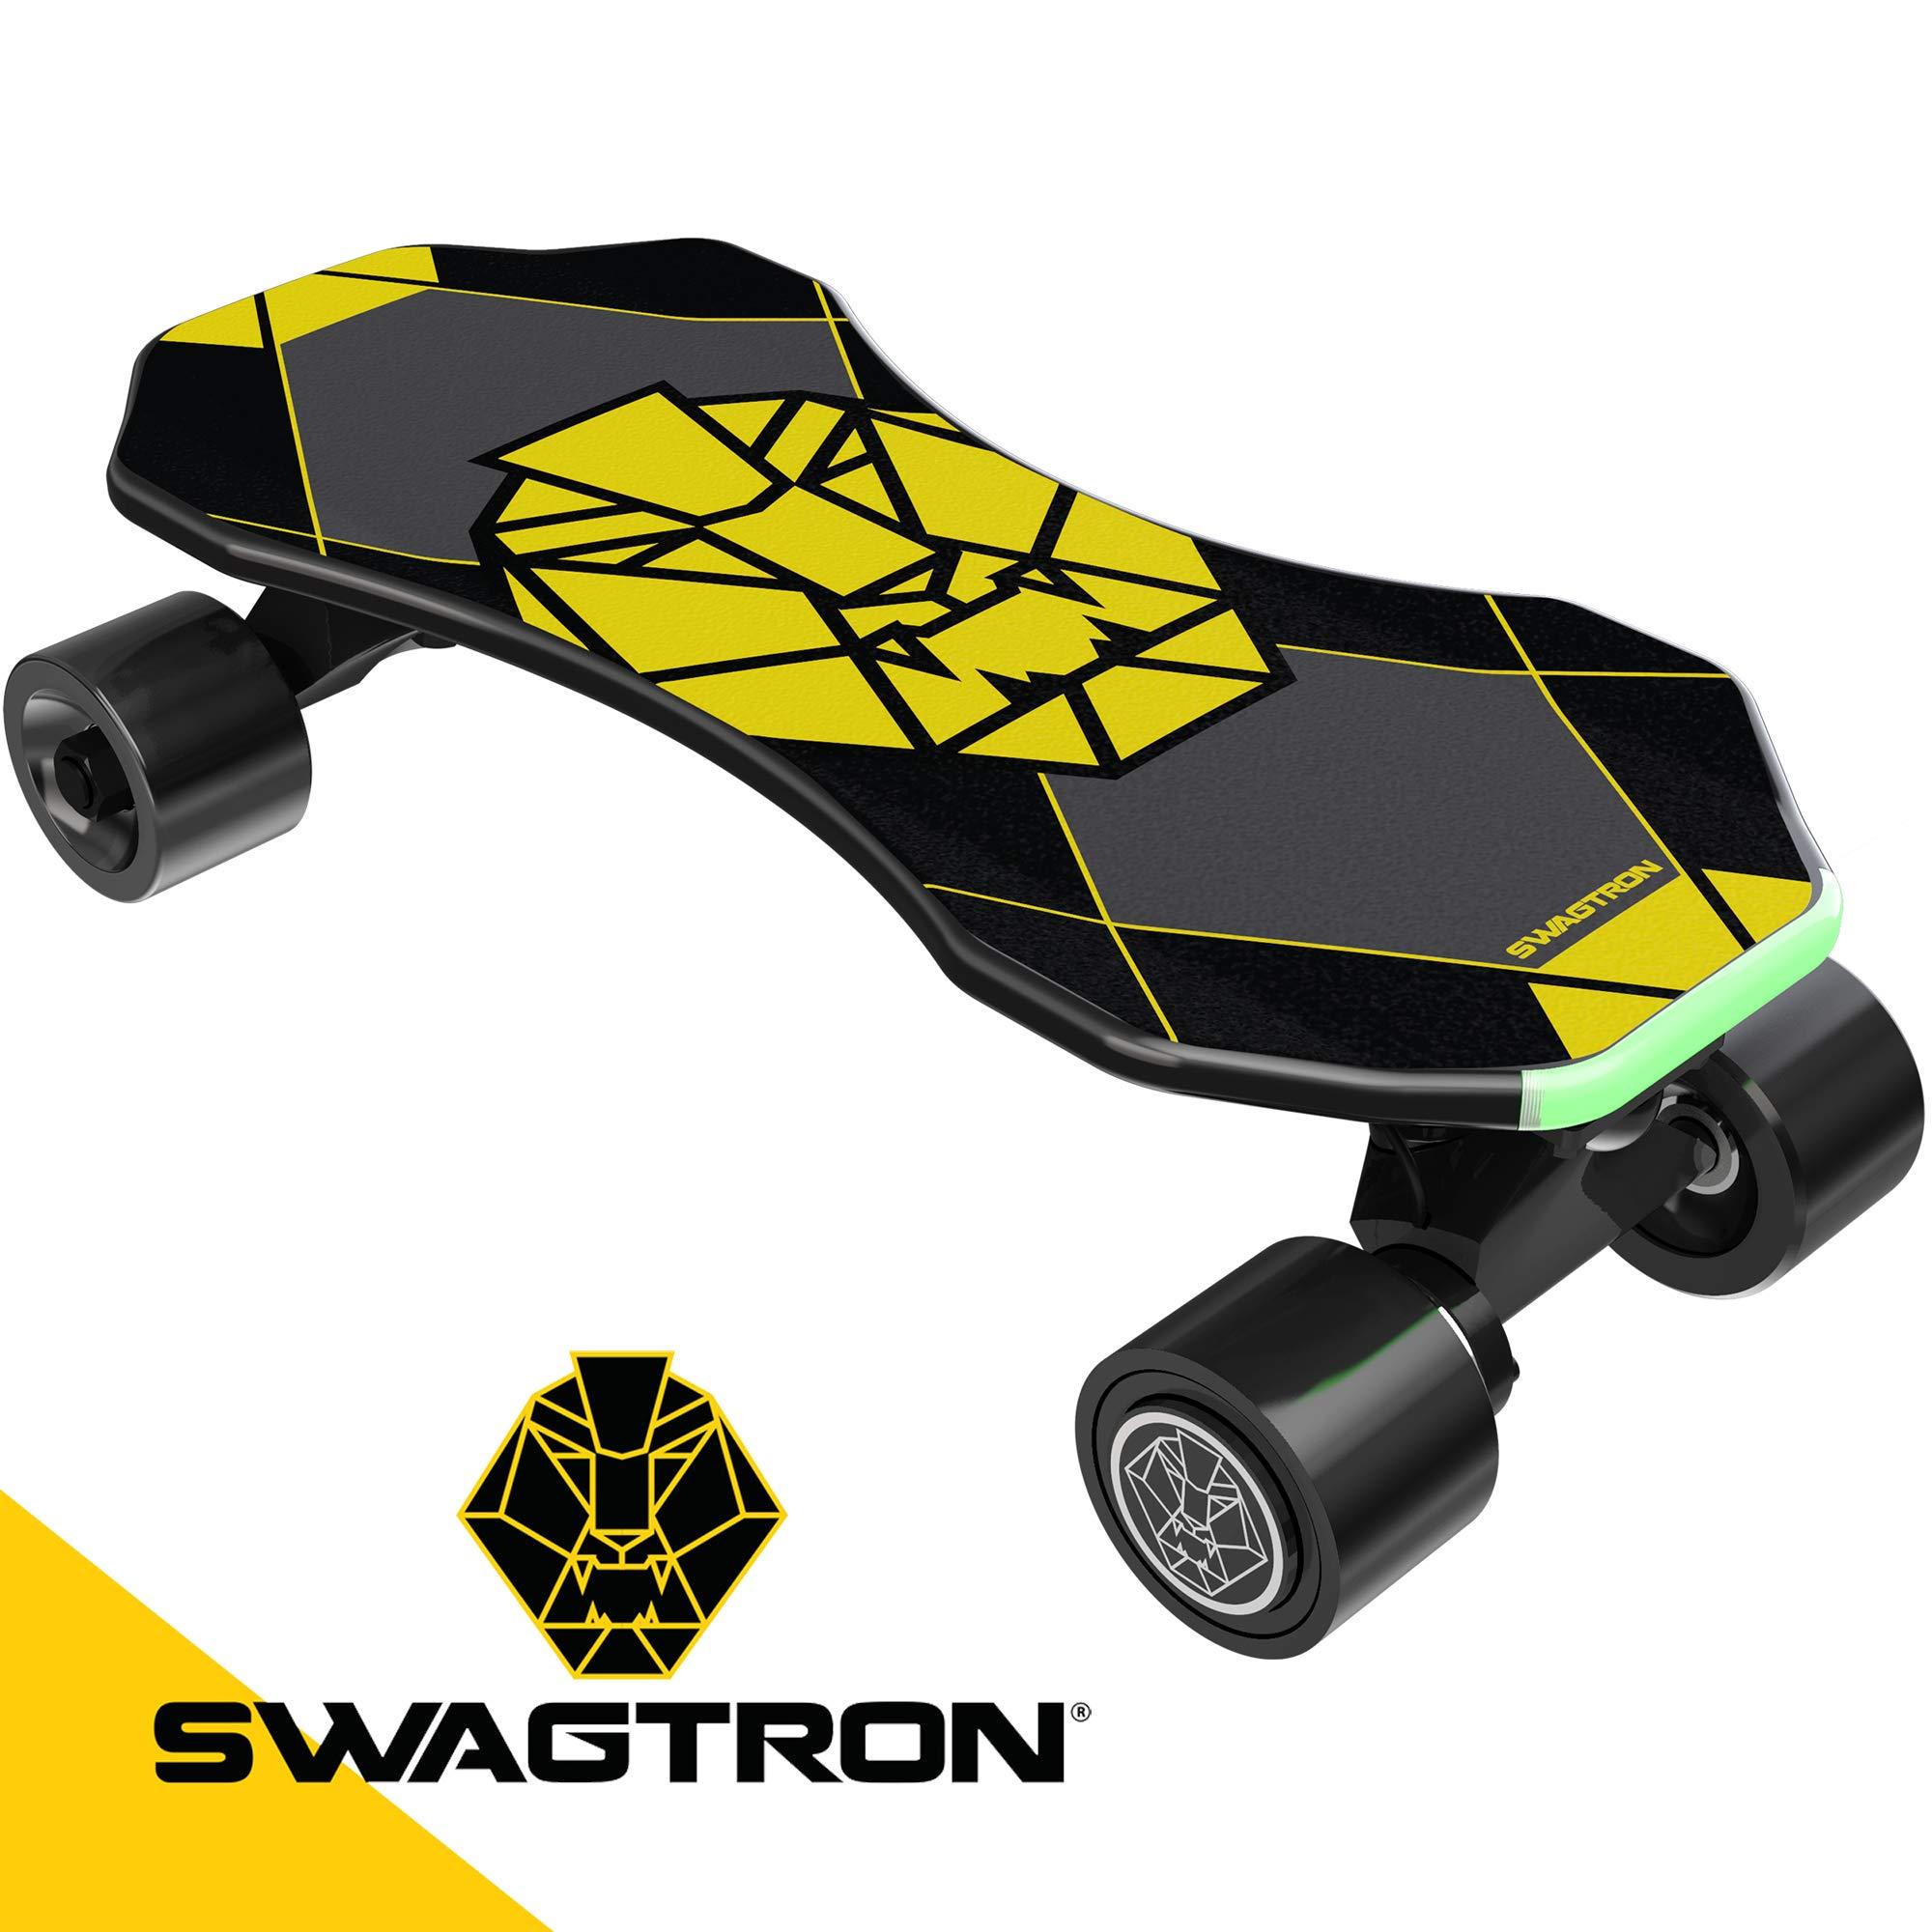 Swagtron Swagskate Skateboard Kick Assist Move More